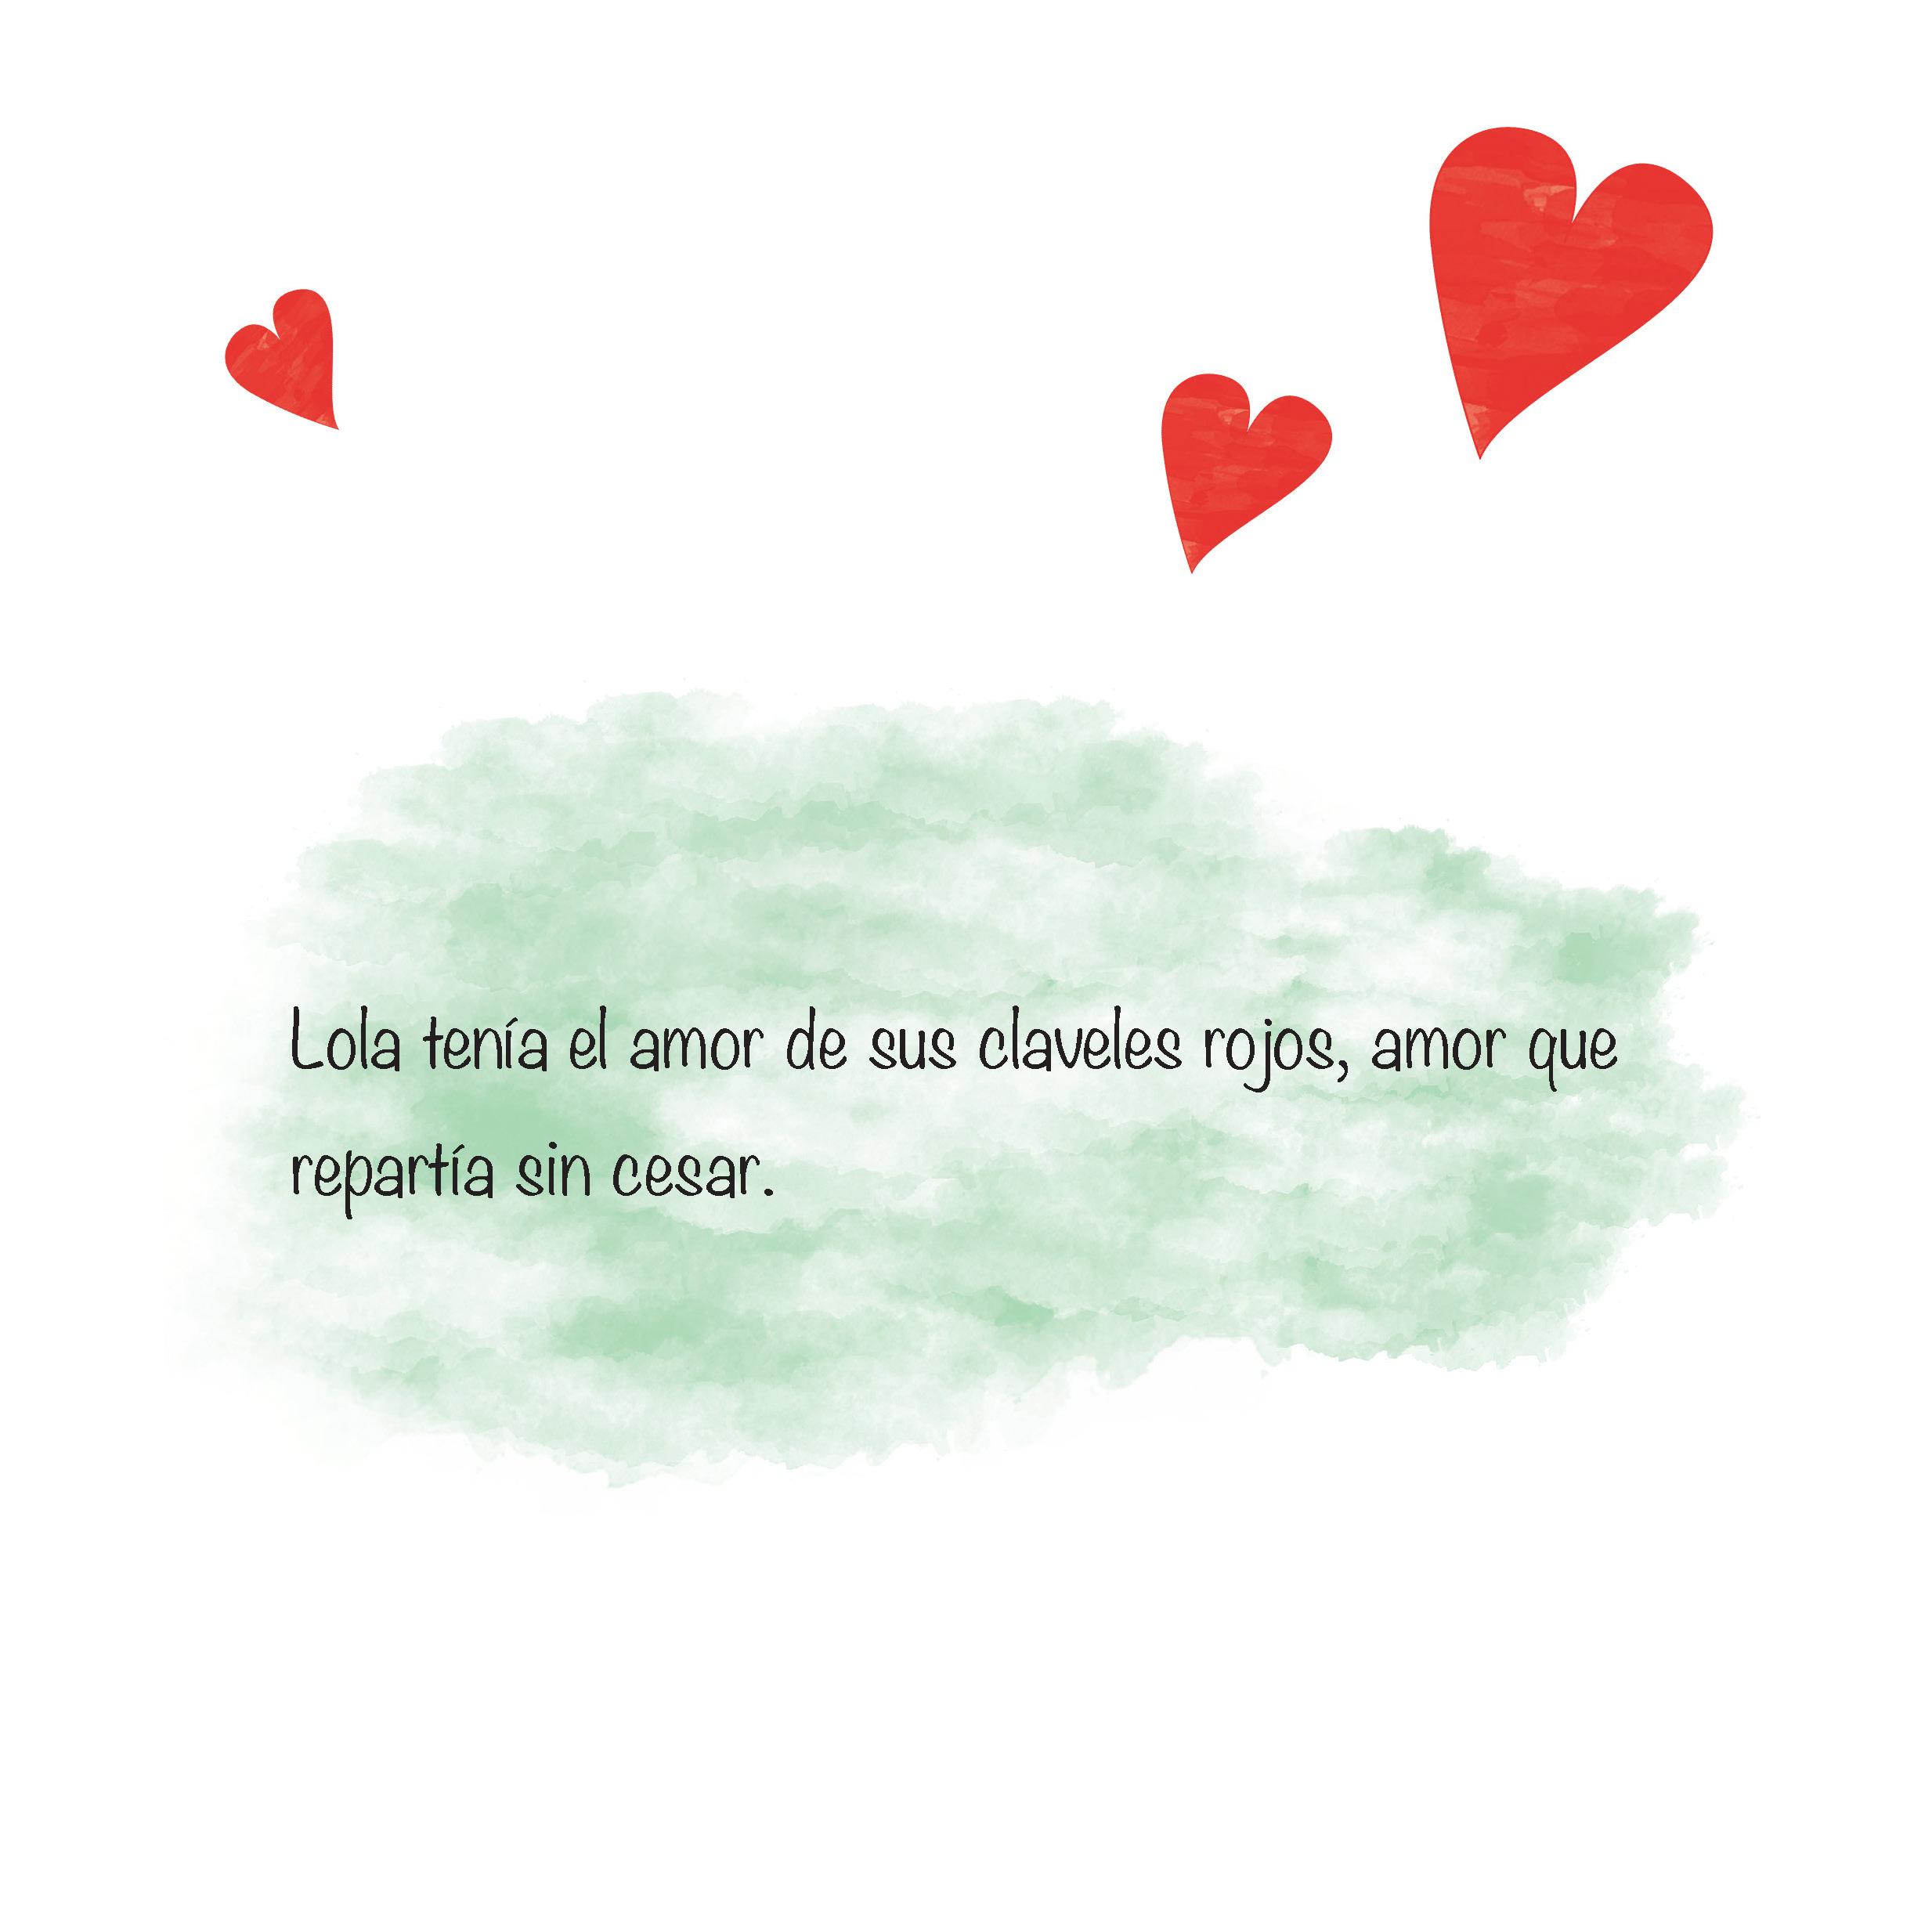 af_lola_Página_13